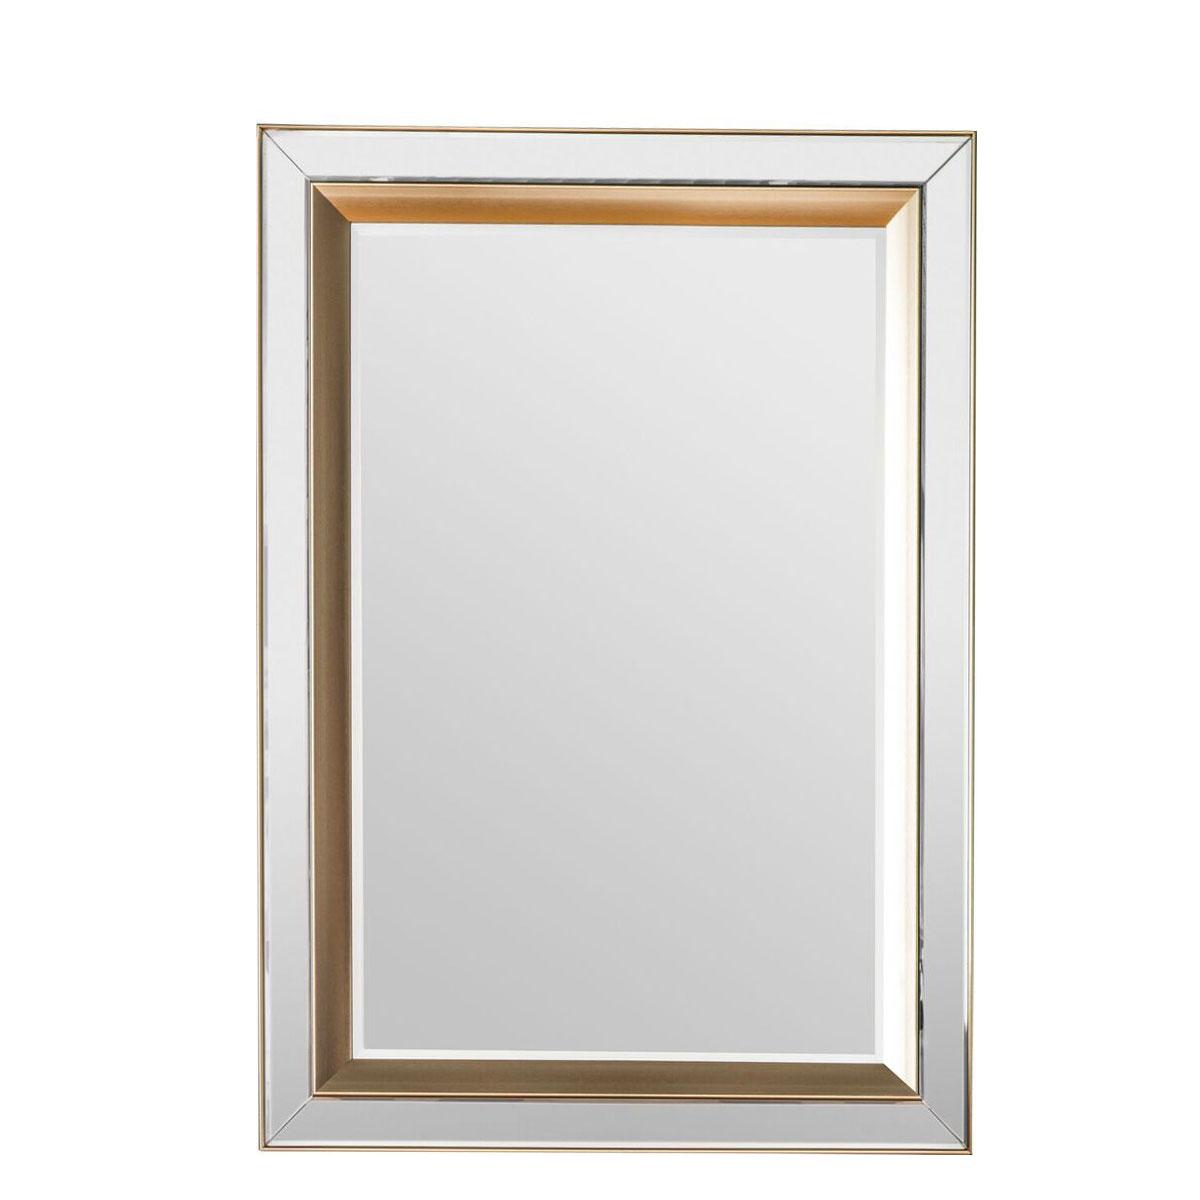 db8bd35c0b45 Opera Gold Inlay Wall Mirror 79 x 109cm